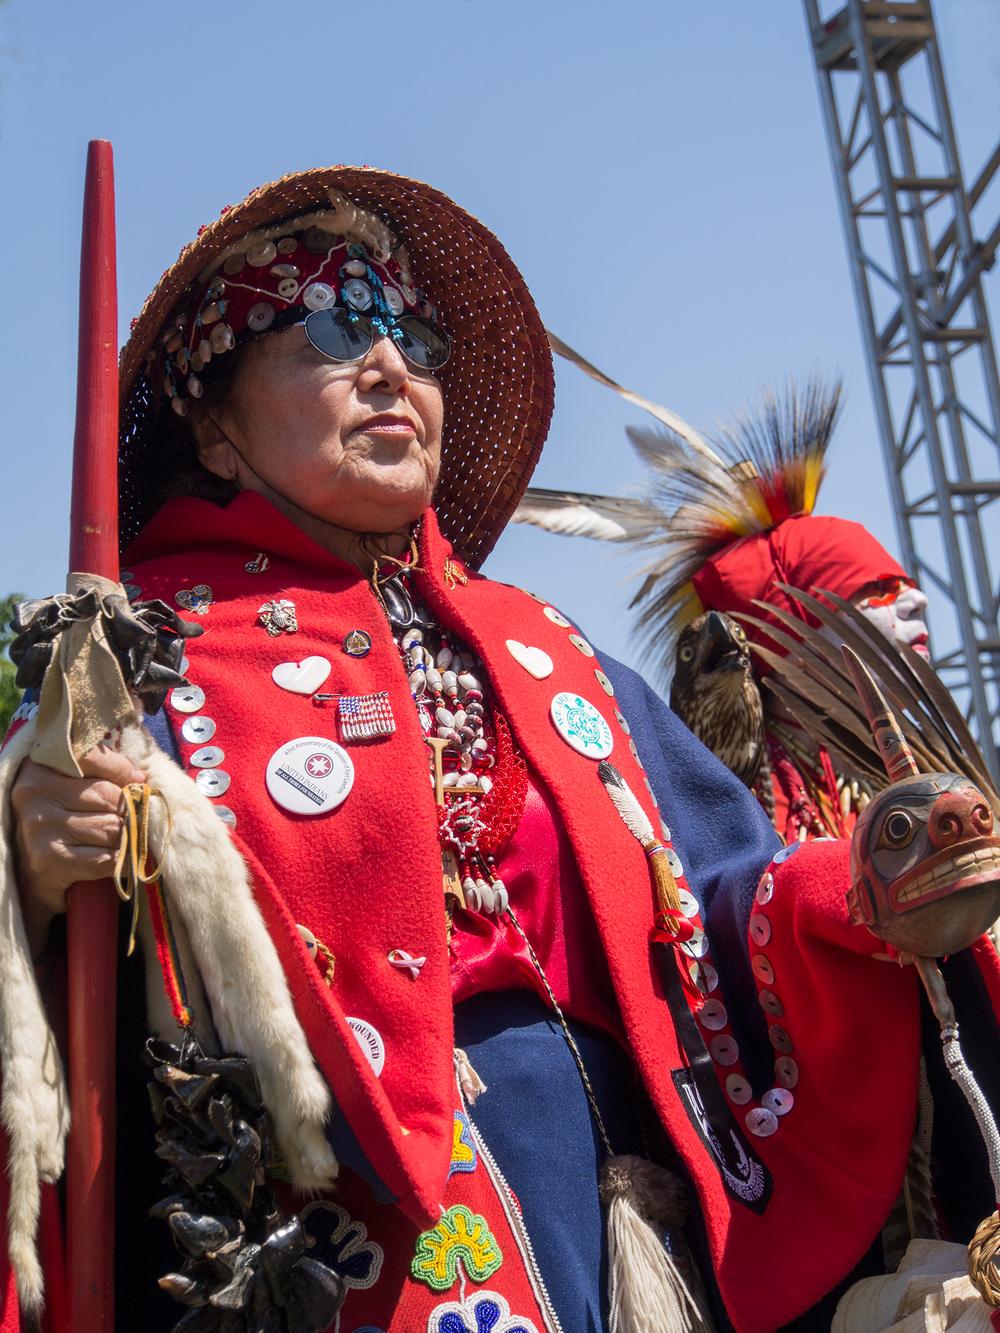 Native American Veteran at Folklife festivities